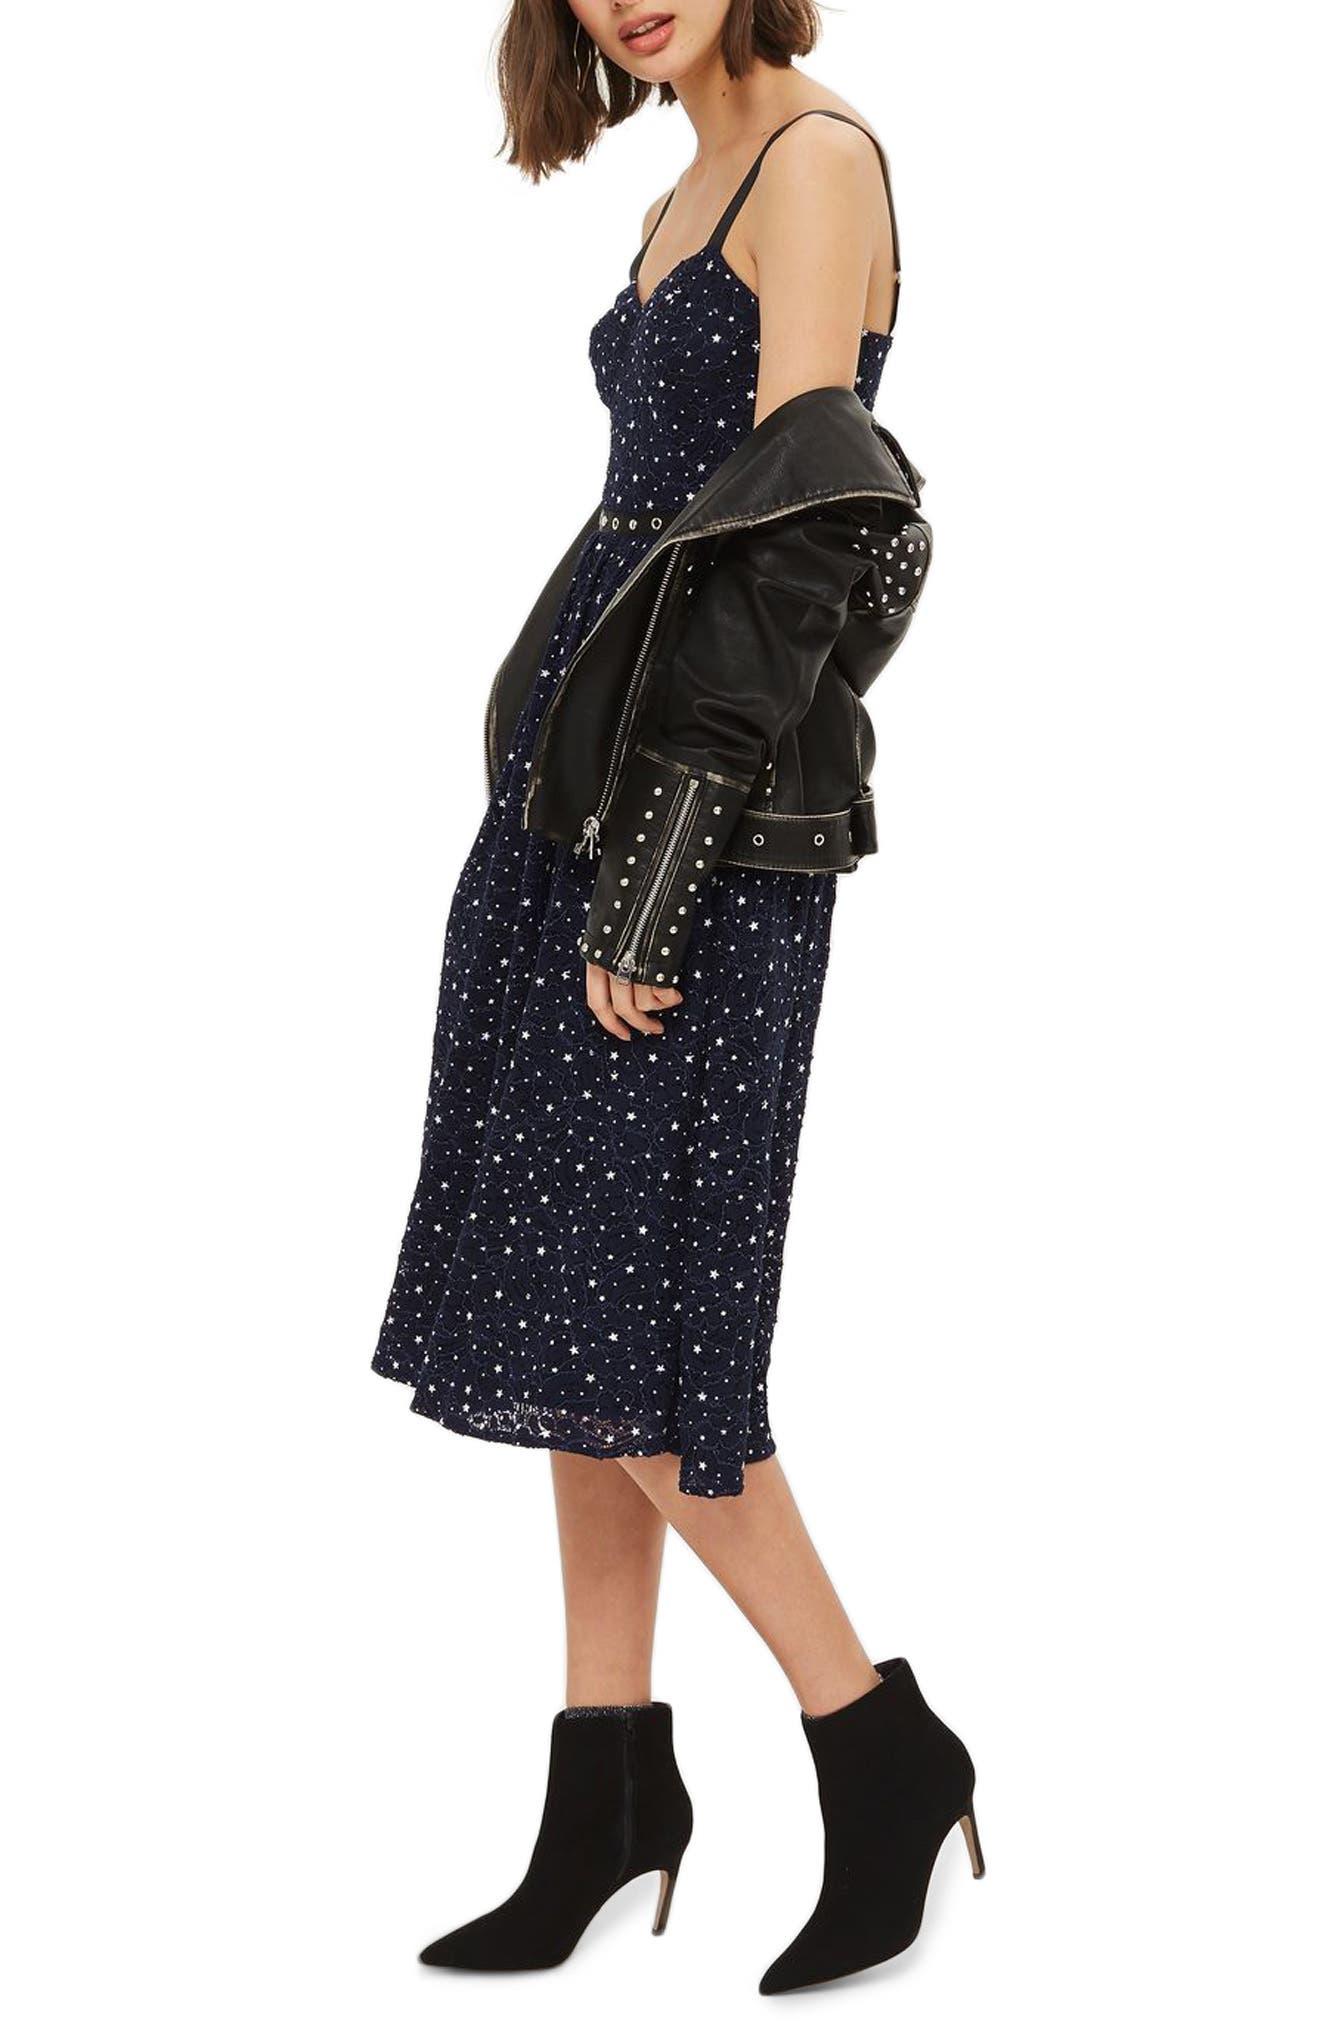 Star Lace Bustier Midi Dress,                             Main thumbnail 1, color,                             Navy Blue Multi